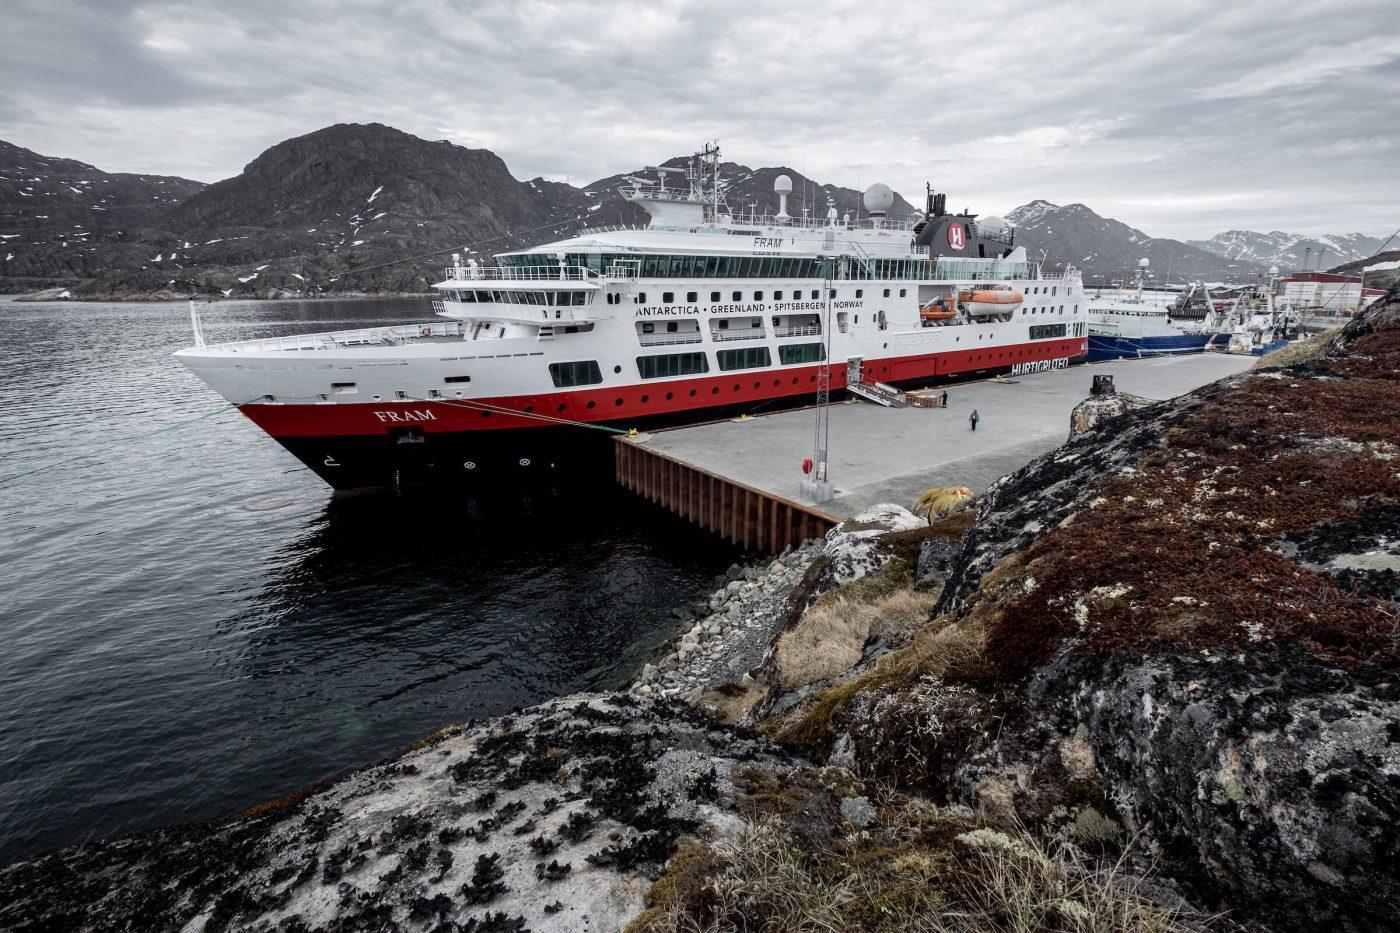 MS Fram from Hurtigruten docked alongside in Sisimiut, Greenland. Photo by Mads Pihl, Visit Greenland